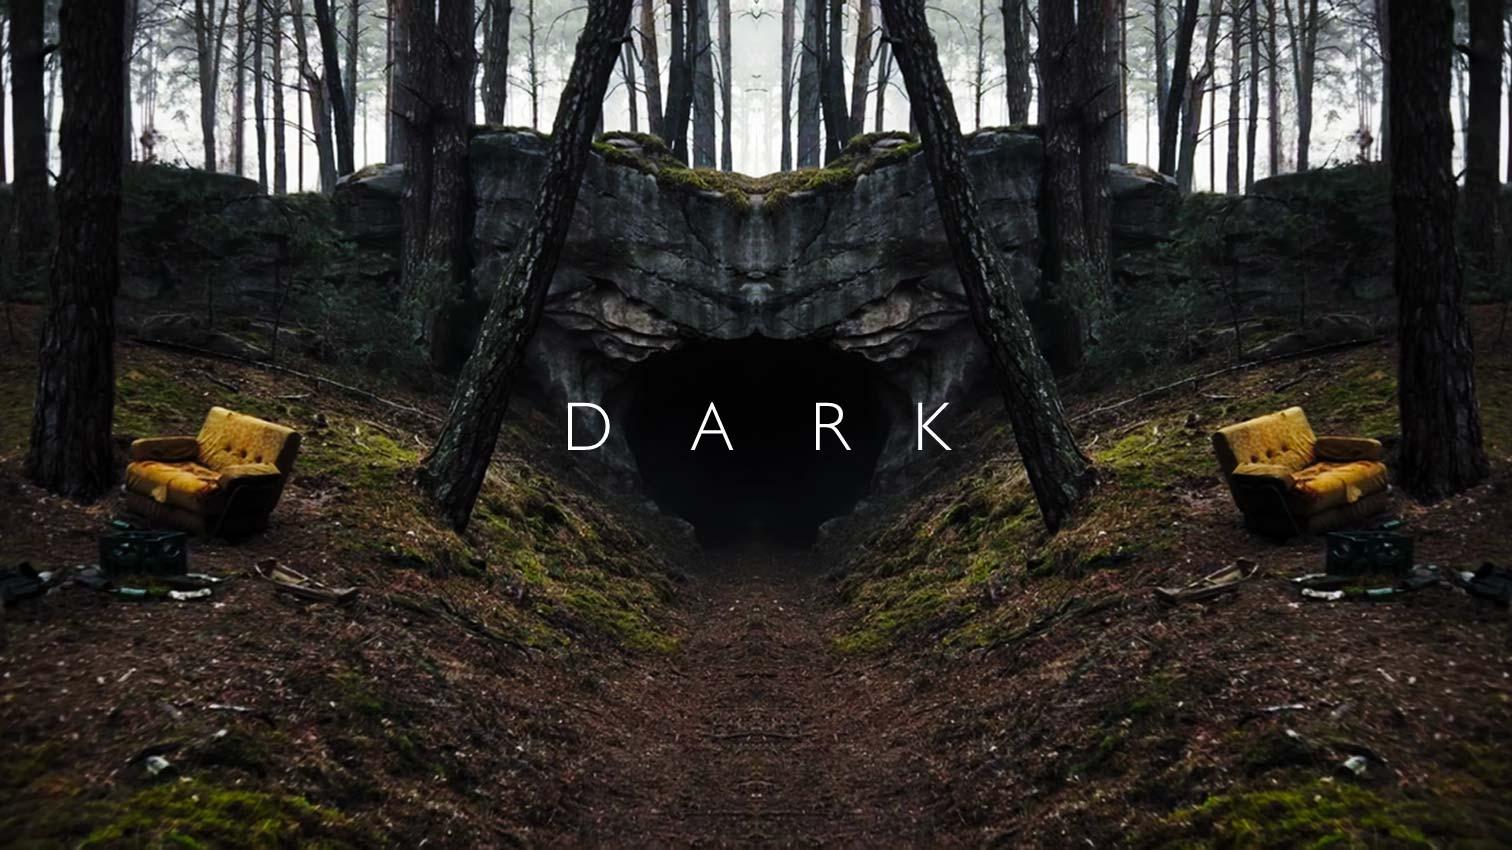 Dark-Grotte-parallele